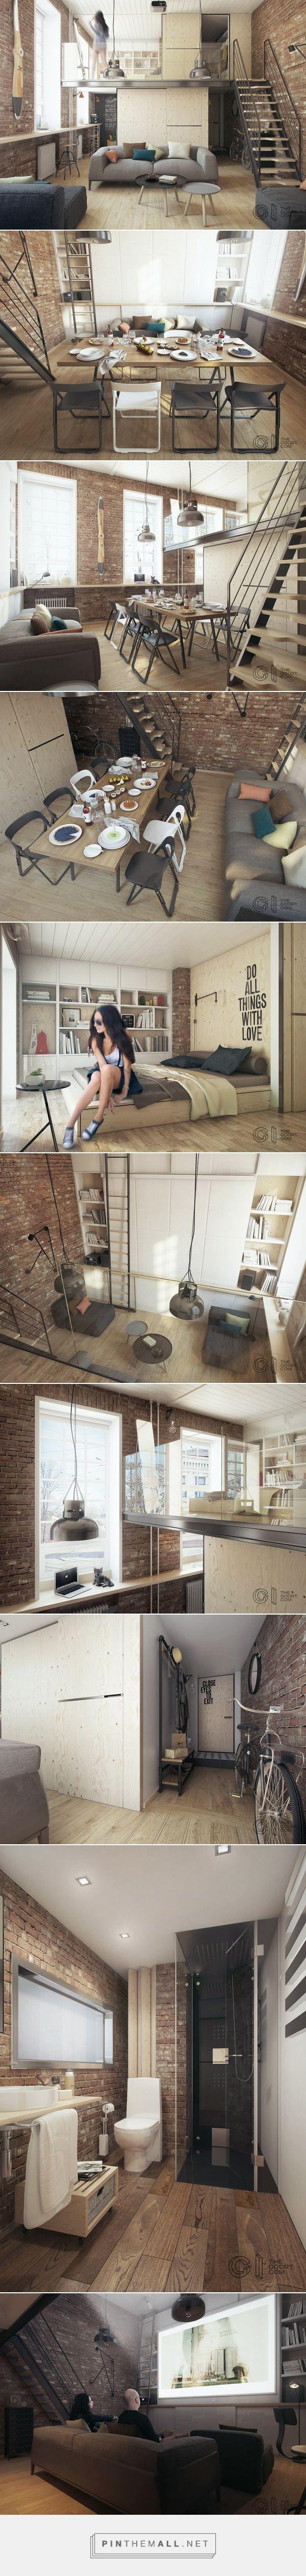 Un pequeño loft de 35 metros cuadrados - Decoracion - EstiloyDeco - created via https://pinthemall.net